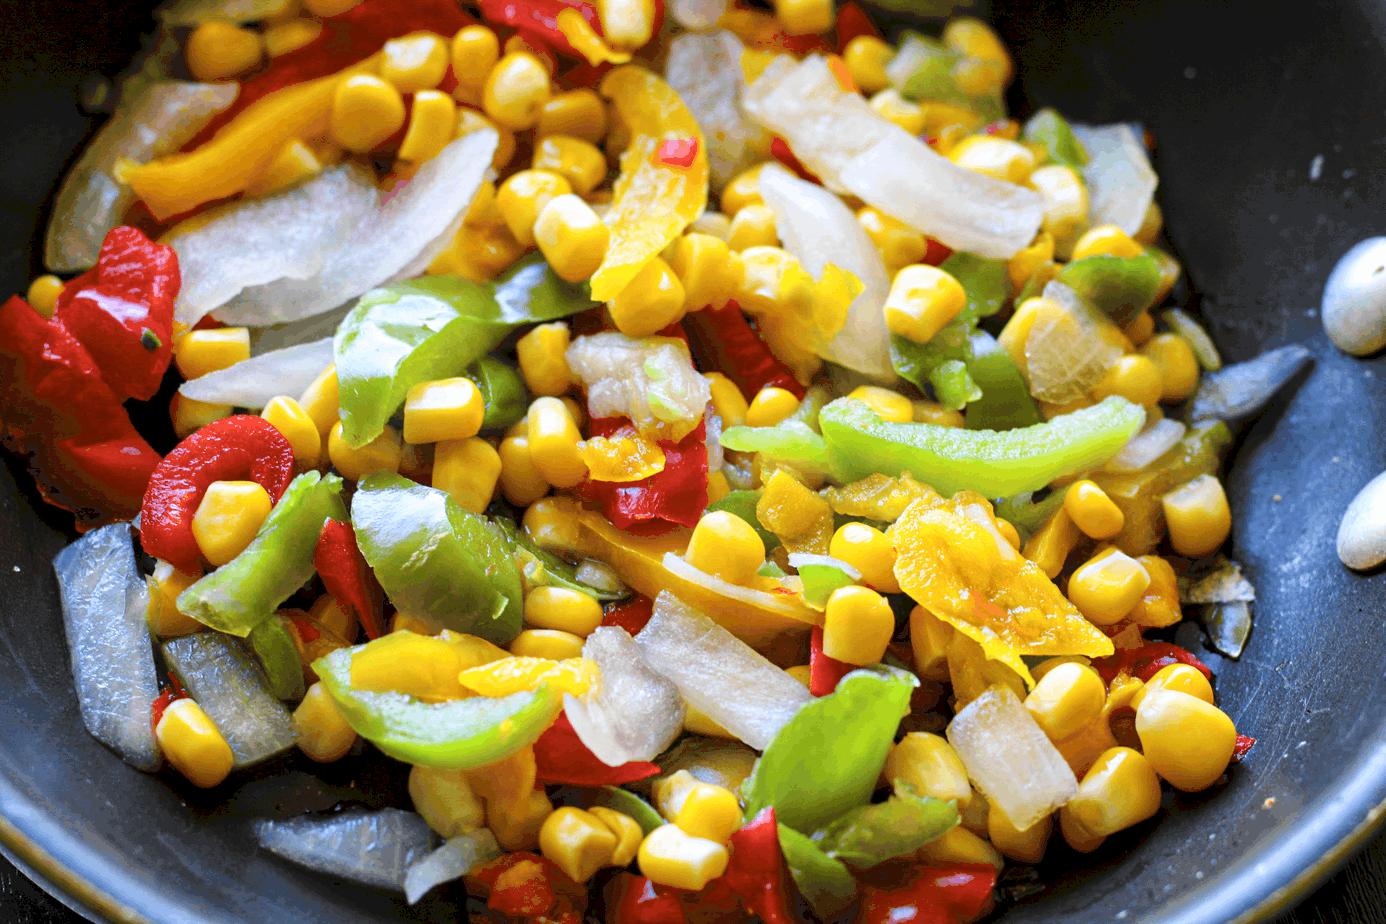 Sautéd vegetables